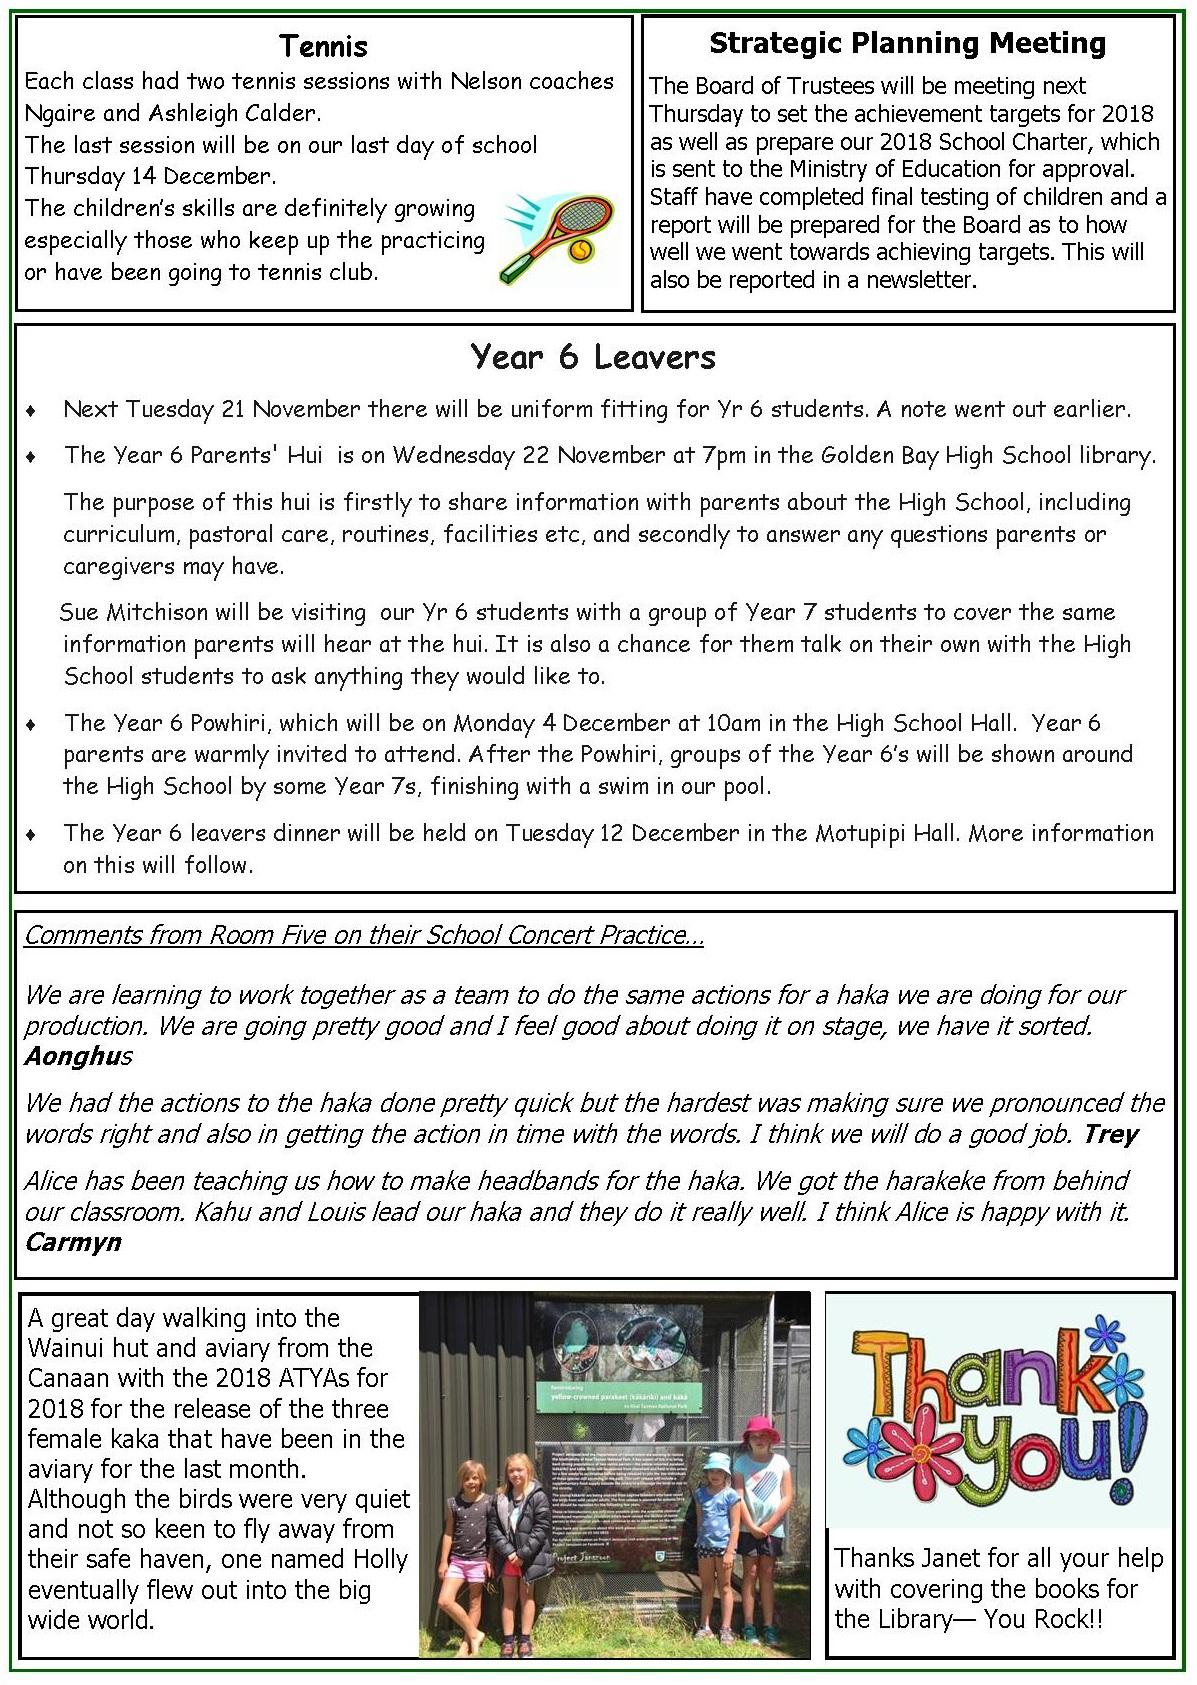 16th November 2017 Page 2.jpg